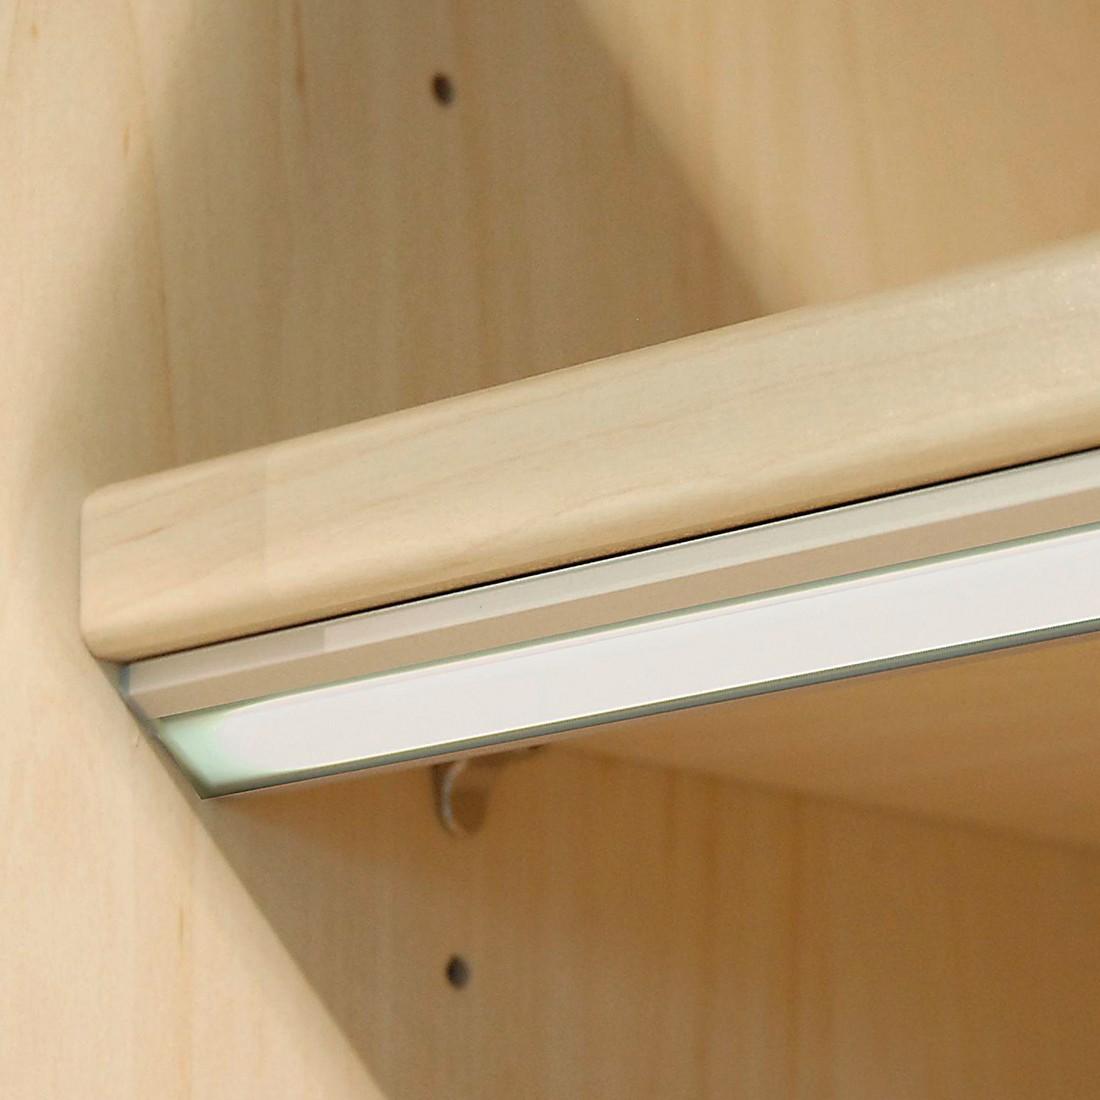 goedkoop energie A+ LED verlichting voor schuifdeurkasten Rauch Dialog Rauch Dialog